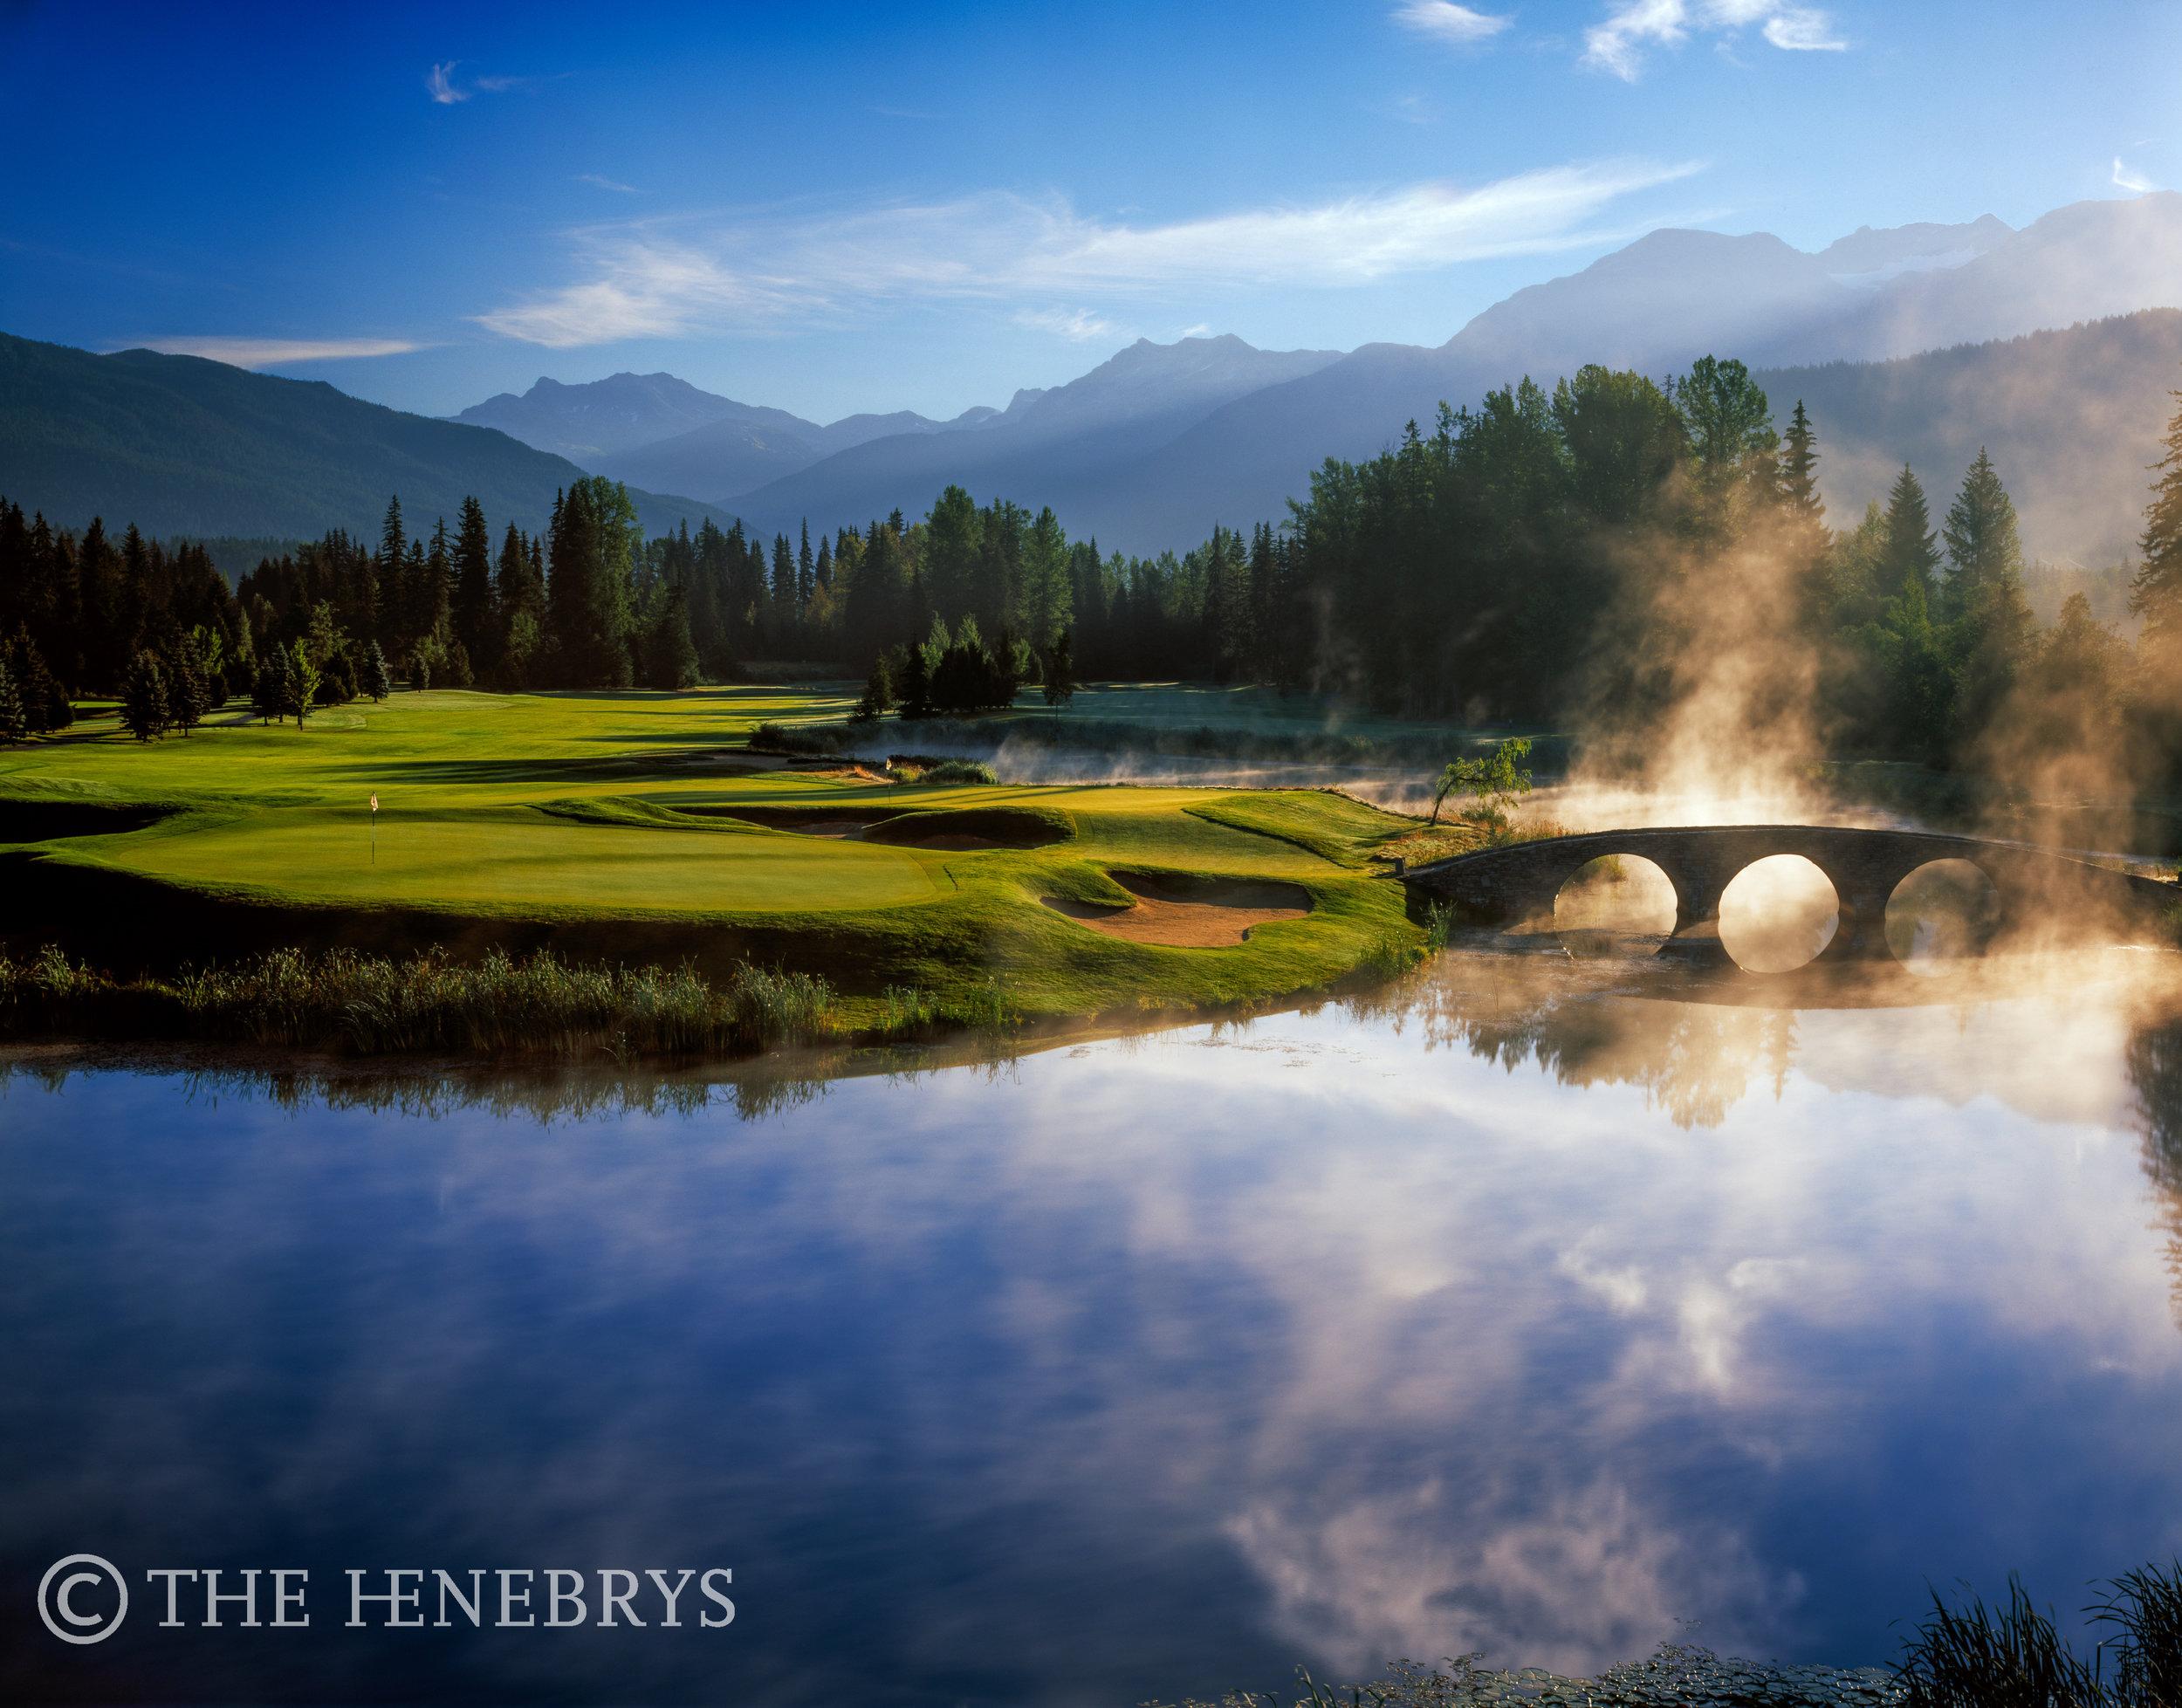 12/3 Nicklaus North Golf Club, Whistler, BC Canada